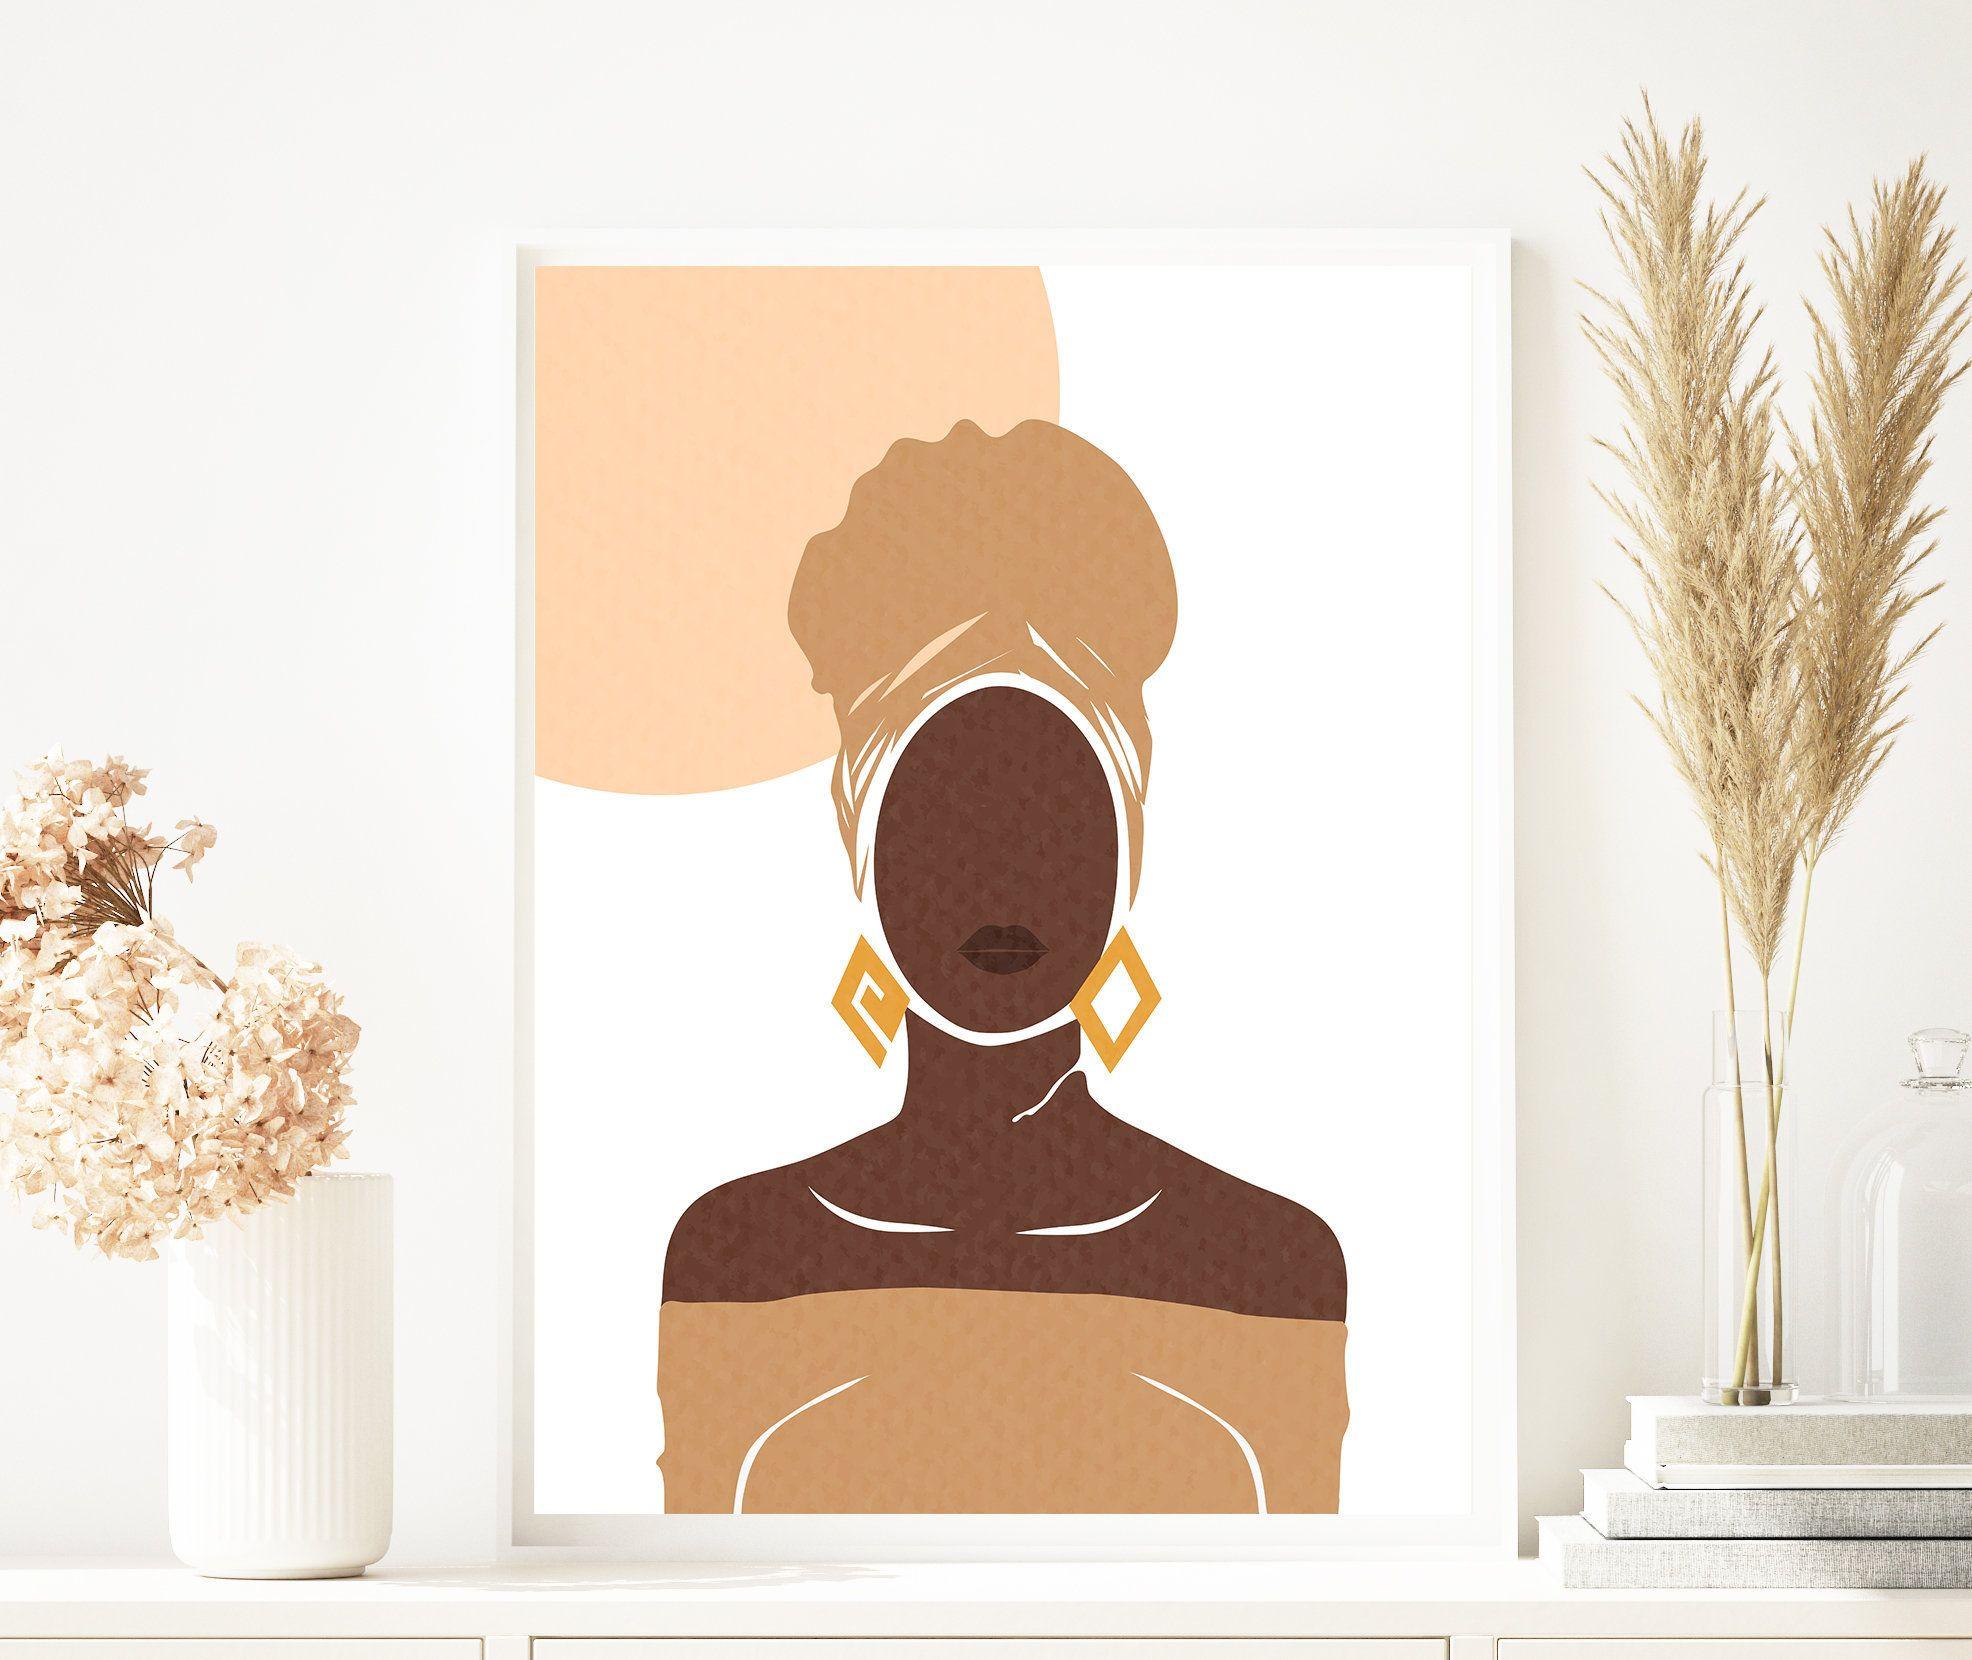 Boho Wall Decor Prints Boho Chic Wall Decor African American Etsy In 2020 African Wall Art Boho Wall Art African American Wall Art